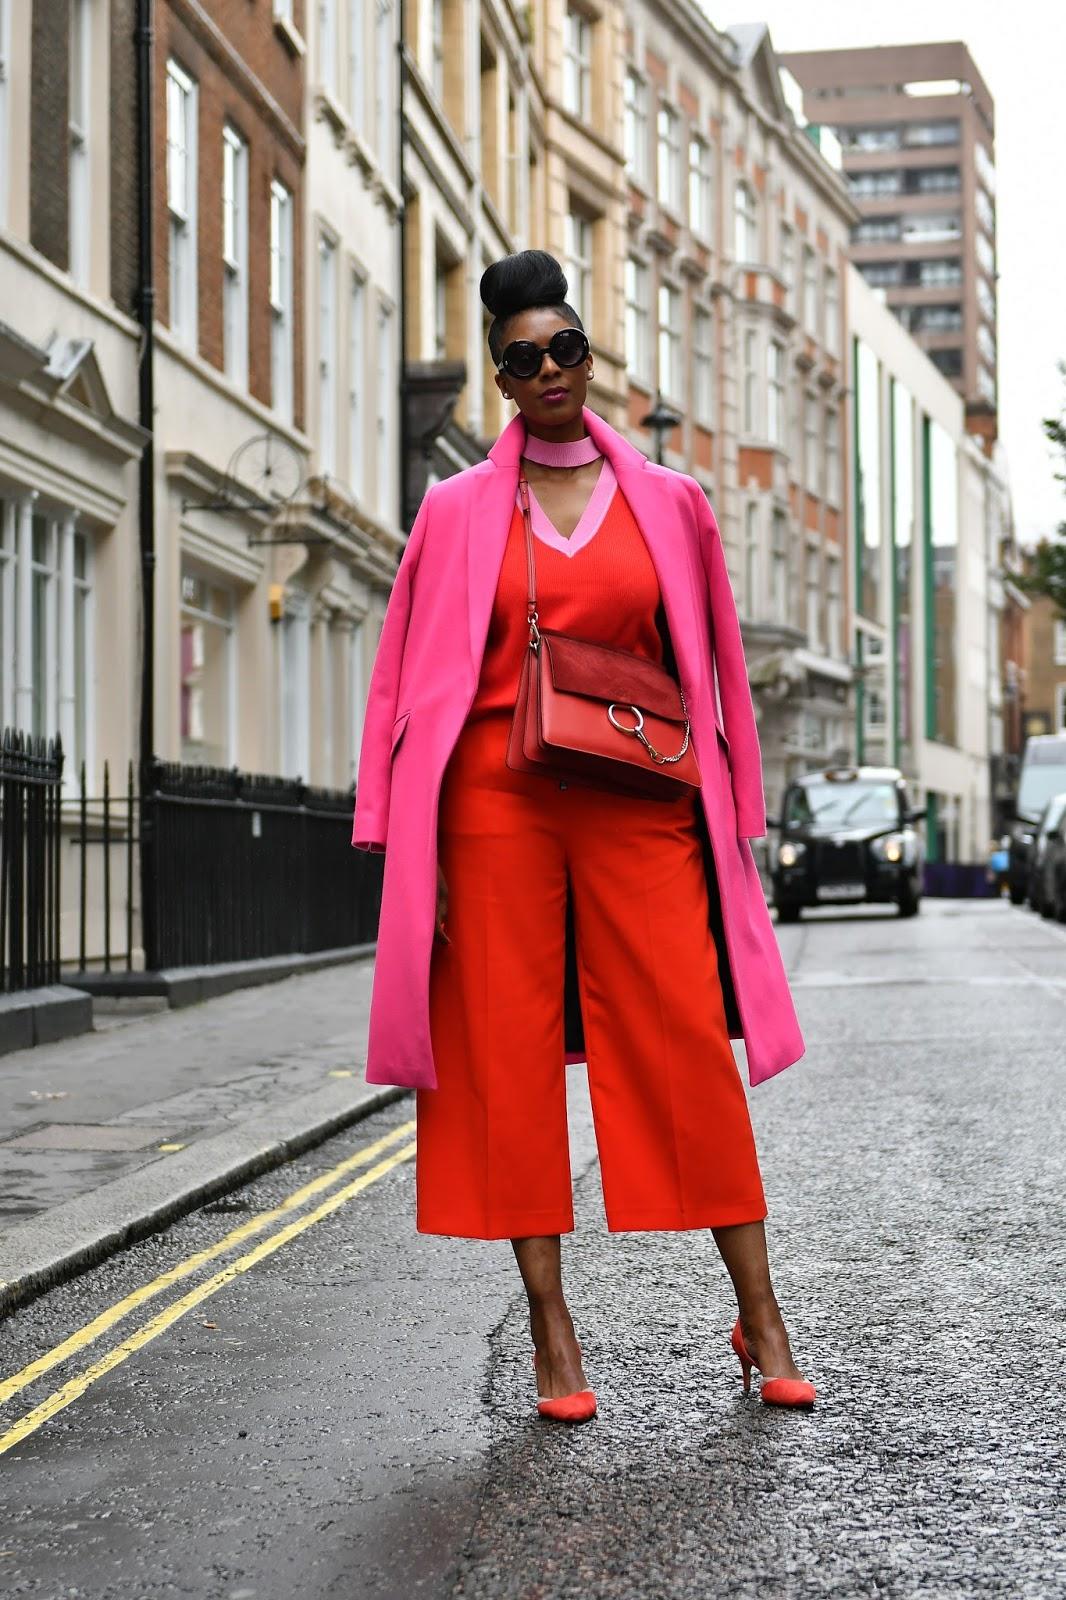 Tall womens fashion advice Very Womens, Mens and Kids Fashion, Furniture